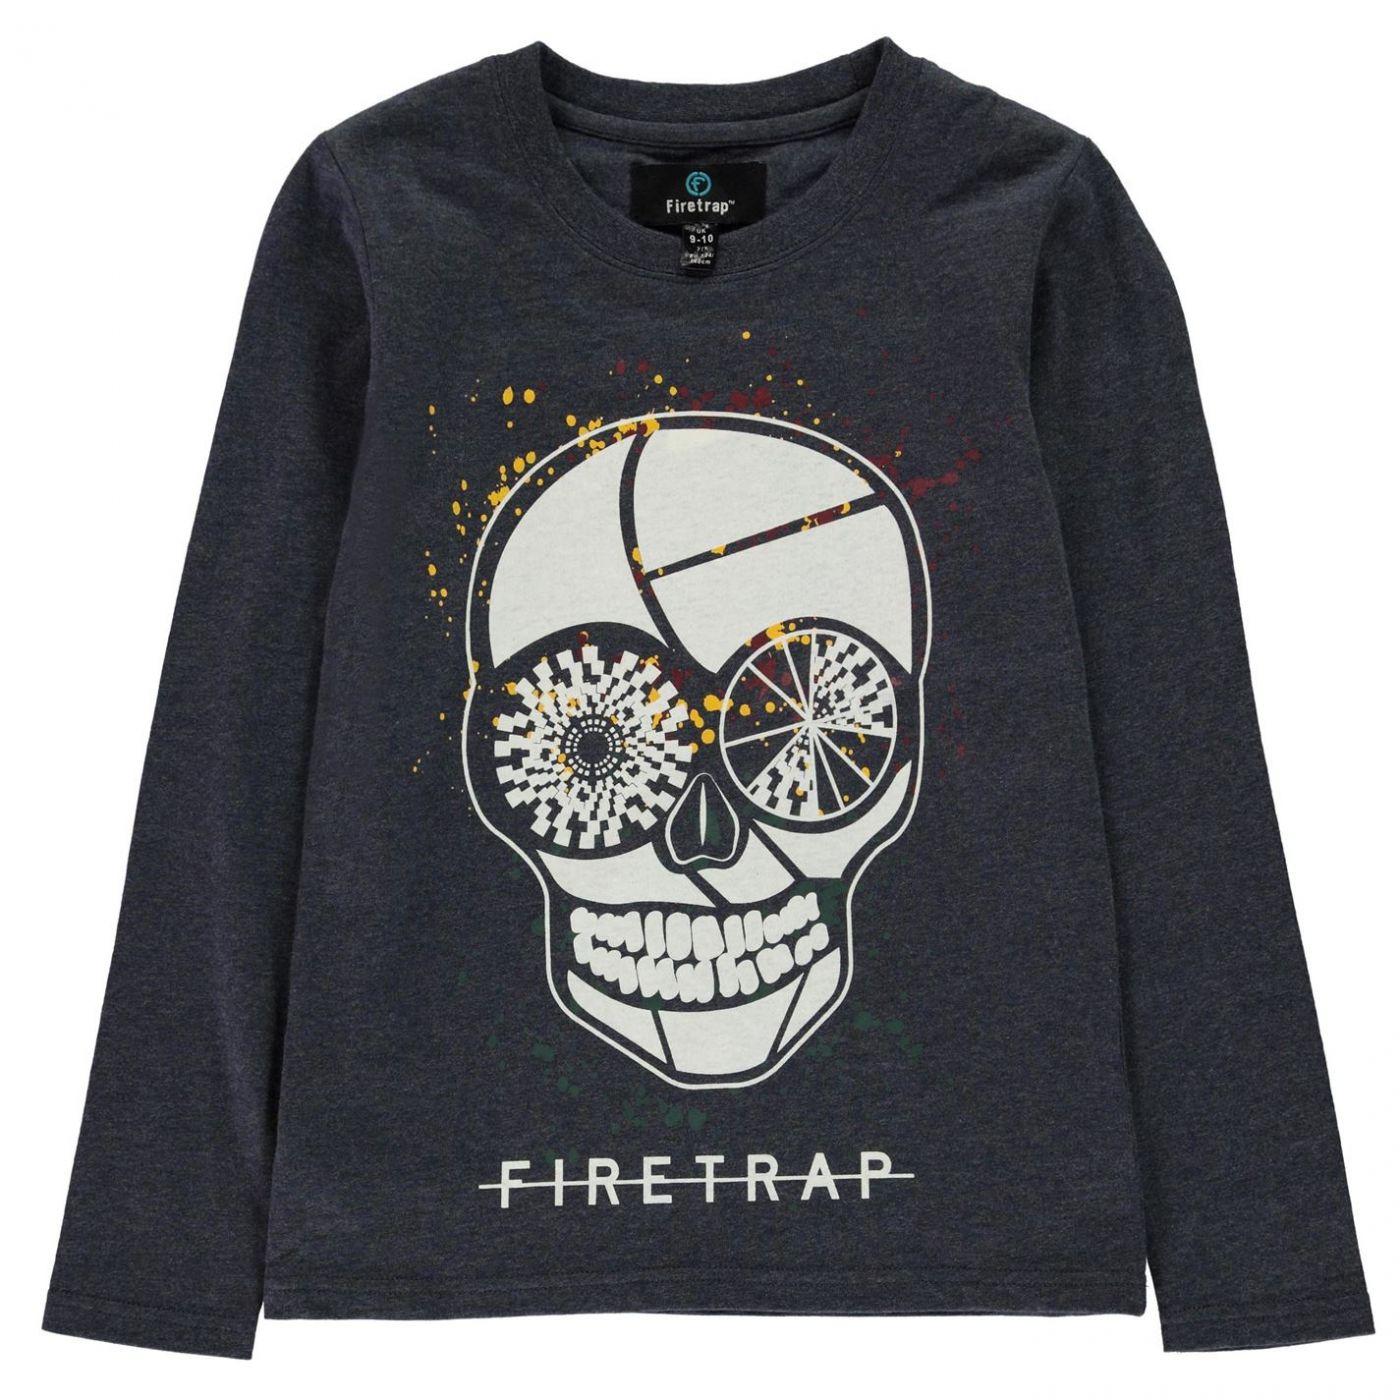 Firetrap Long Sleeve T Shirt Infant Boys